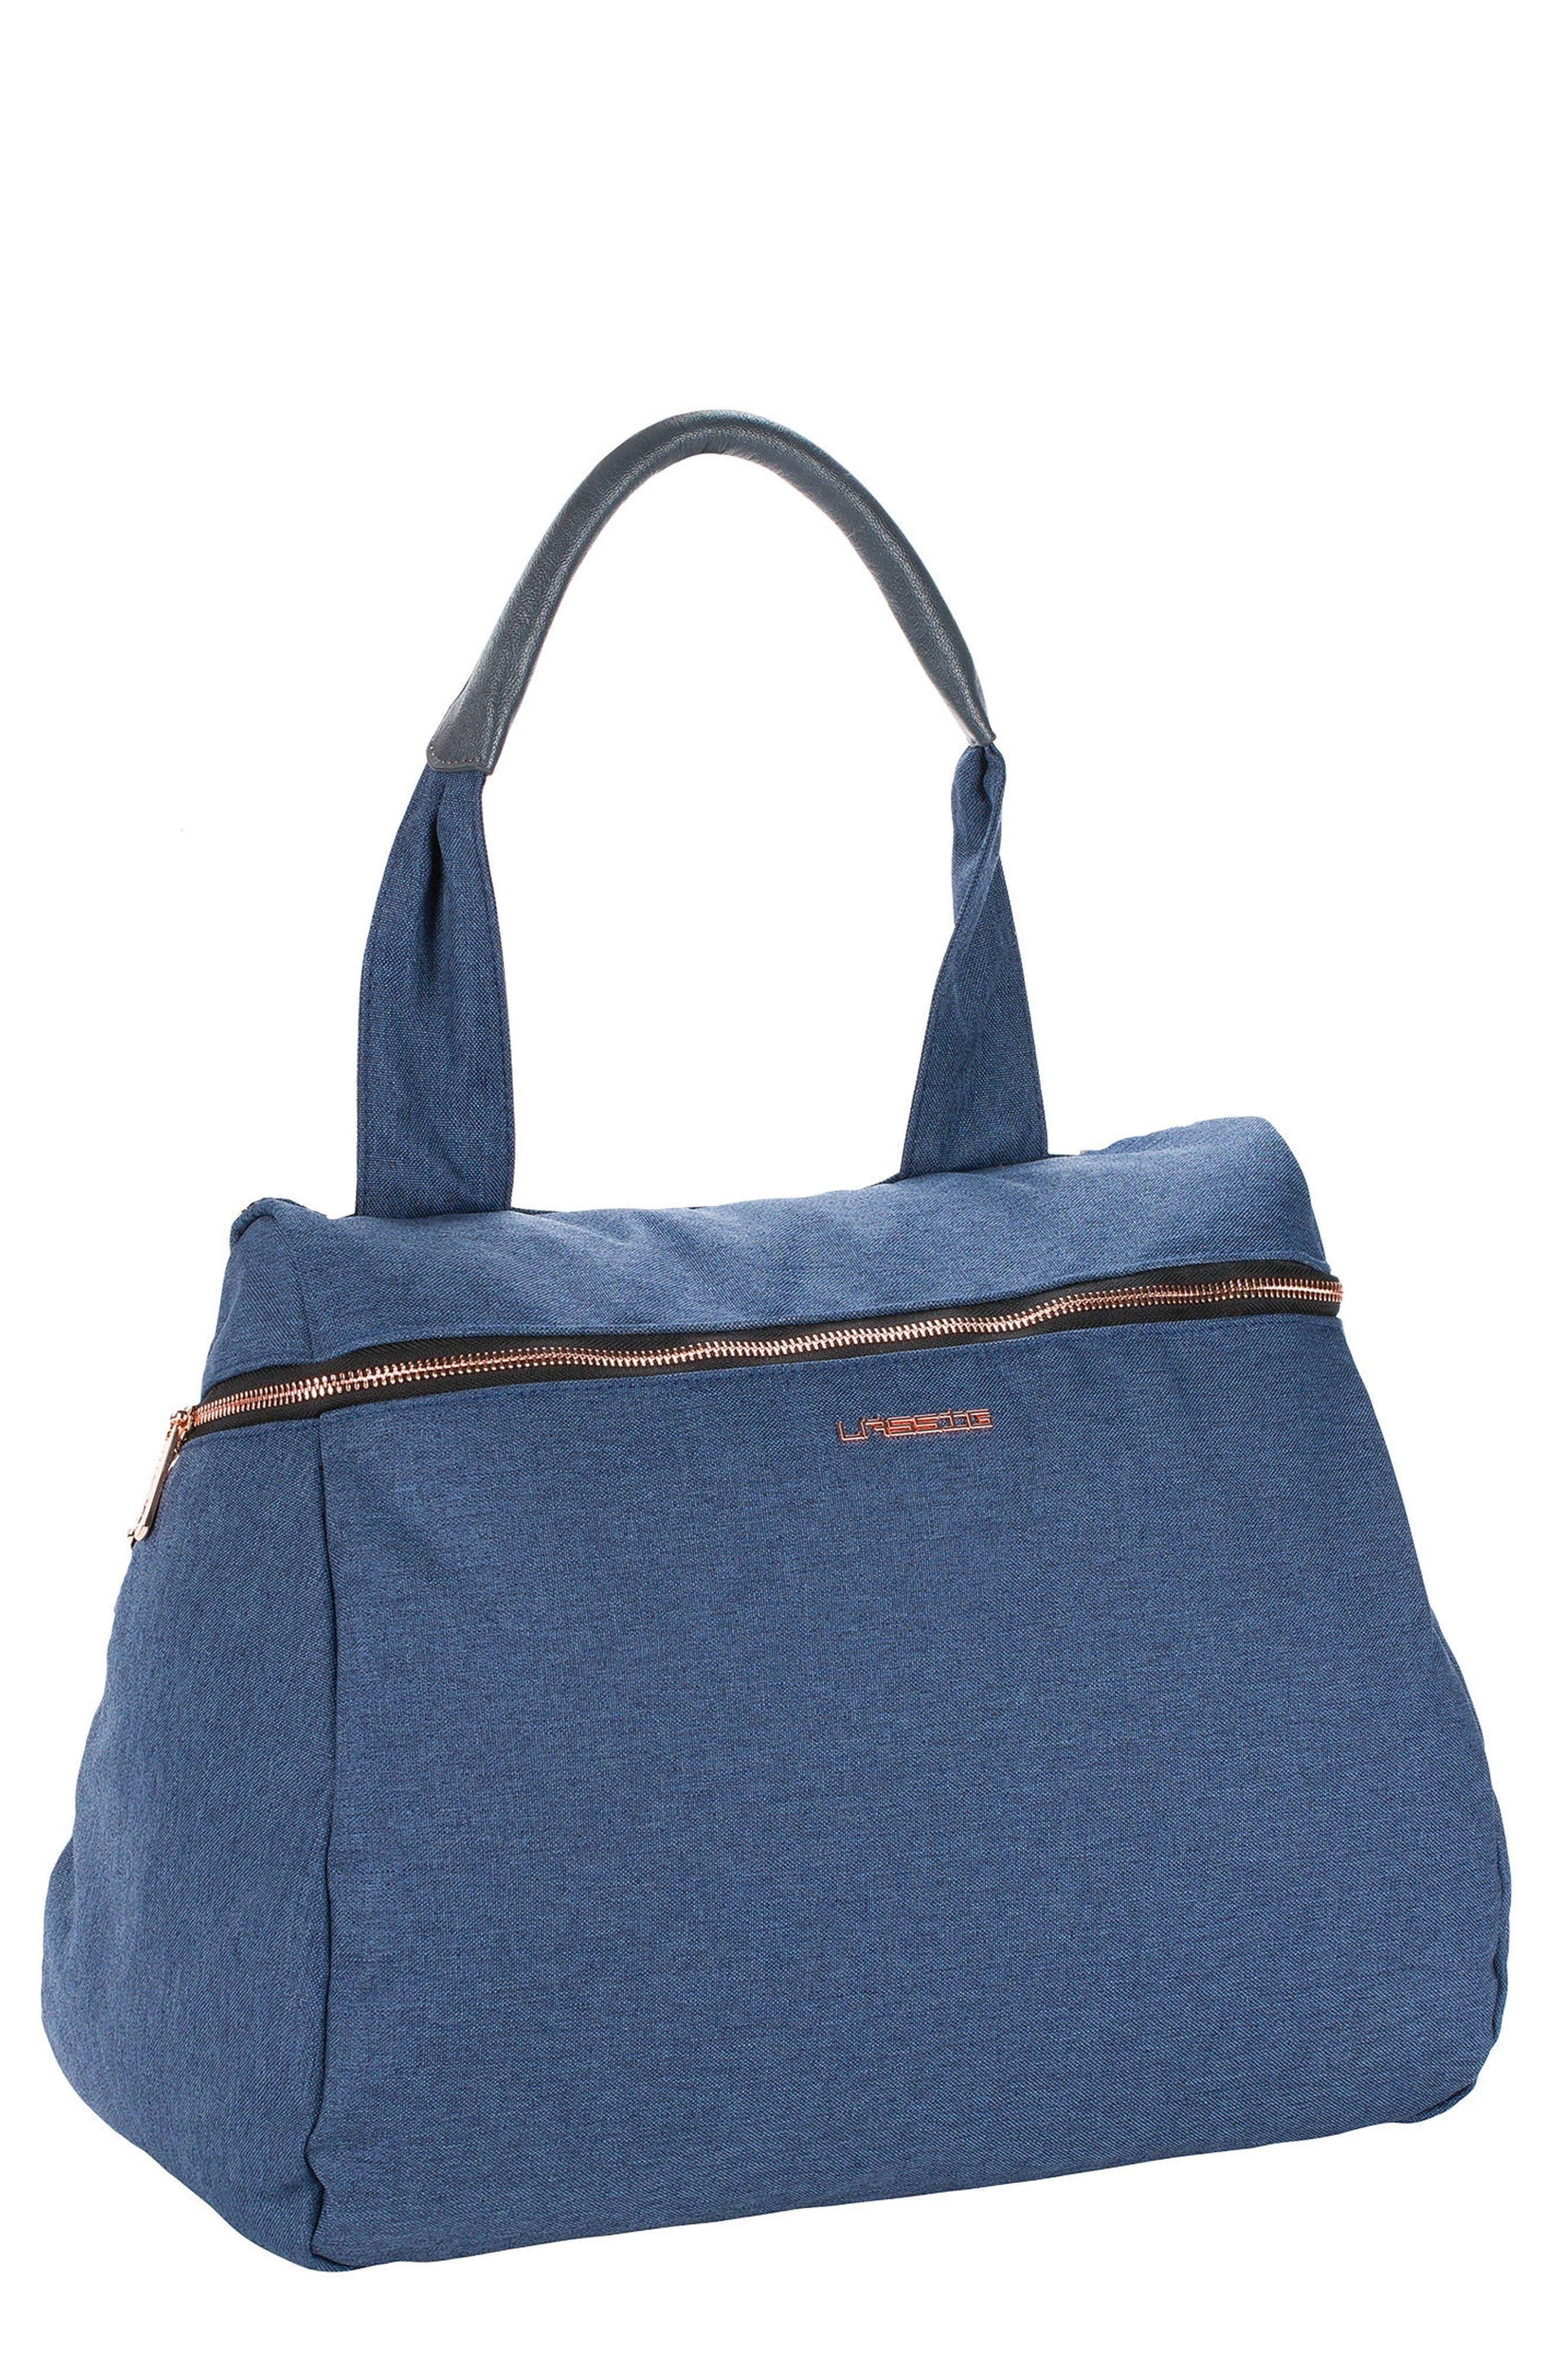 Infant Lassig Glam Rosie Diaper Bag  Blue